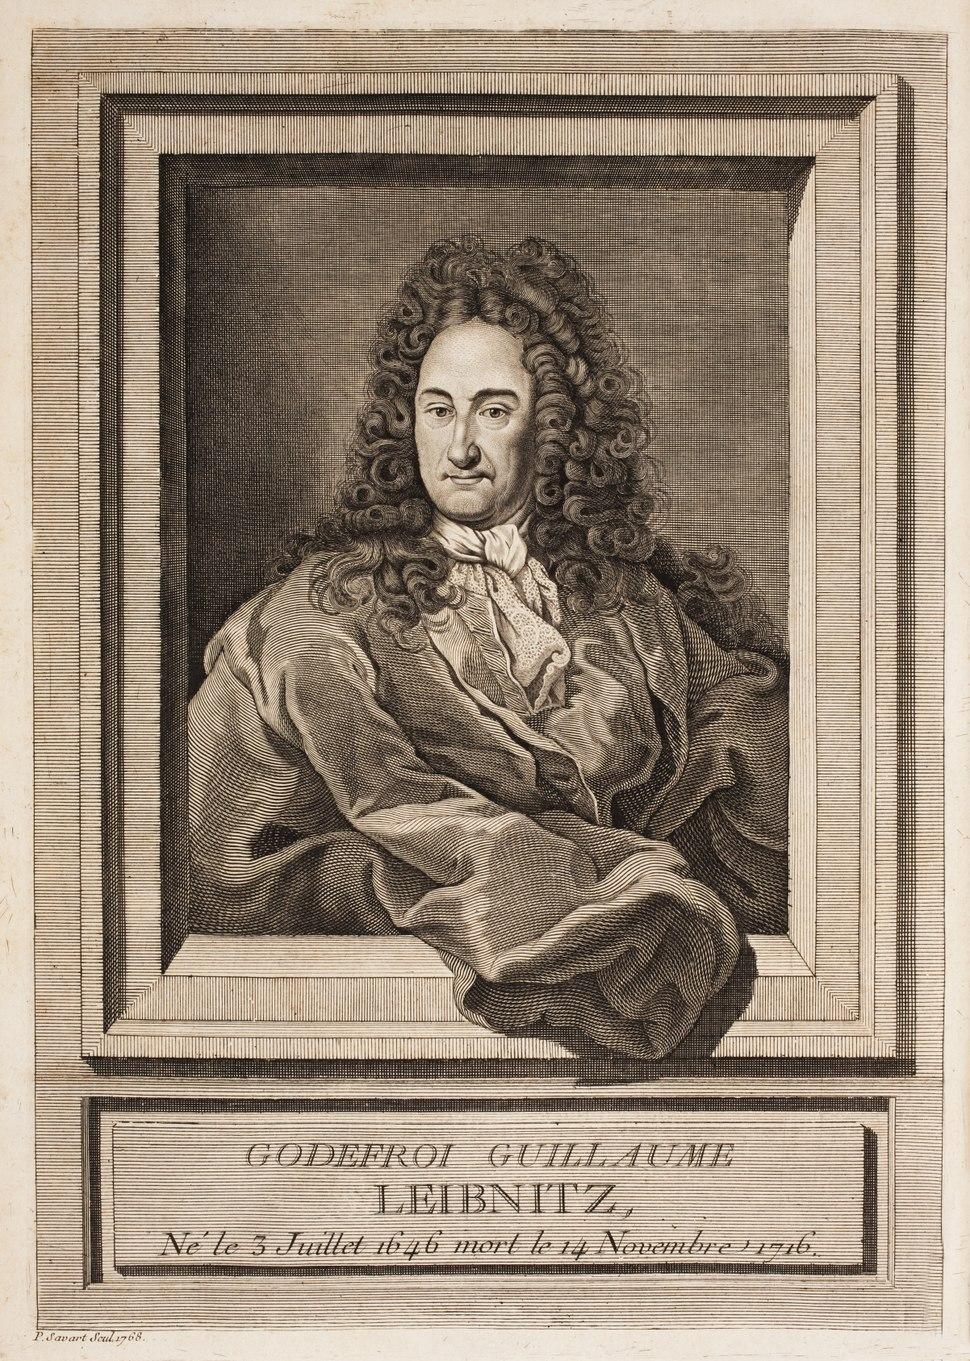 Gottfried-Wilhelm-Leibniz-Louis-Dutens-opera-omnia MG 1180